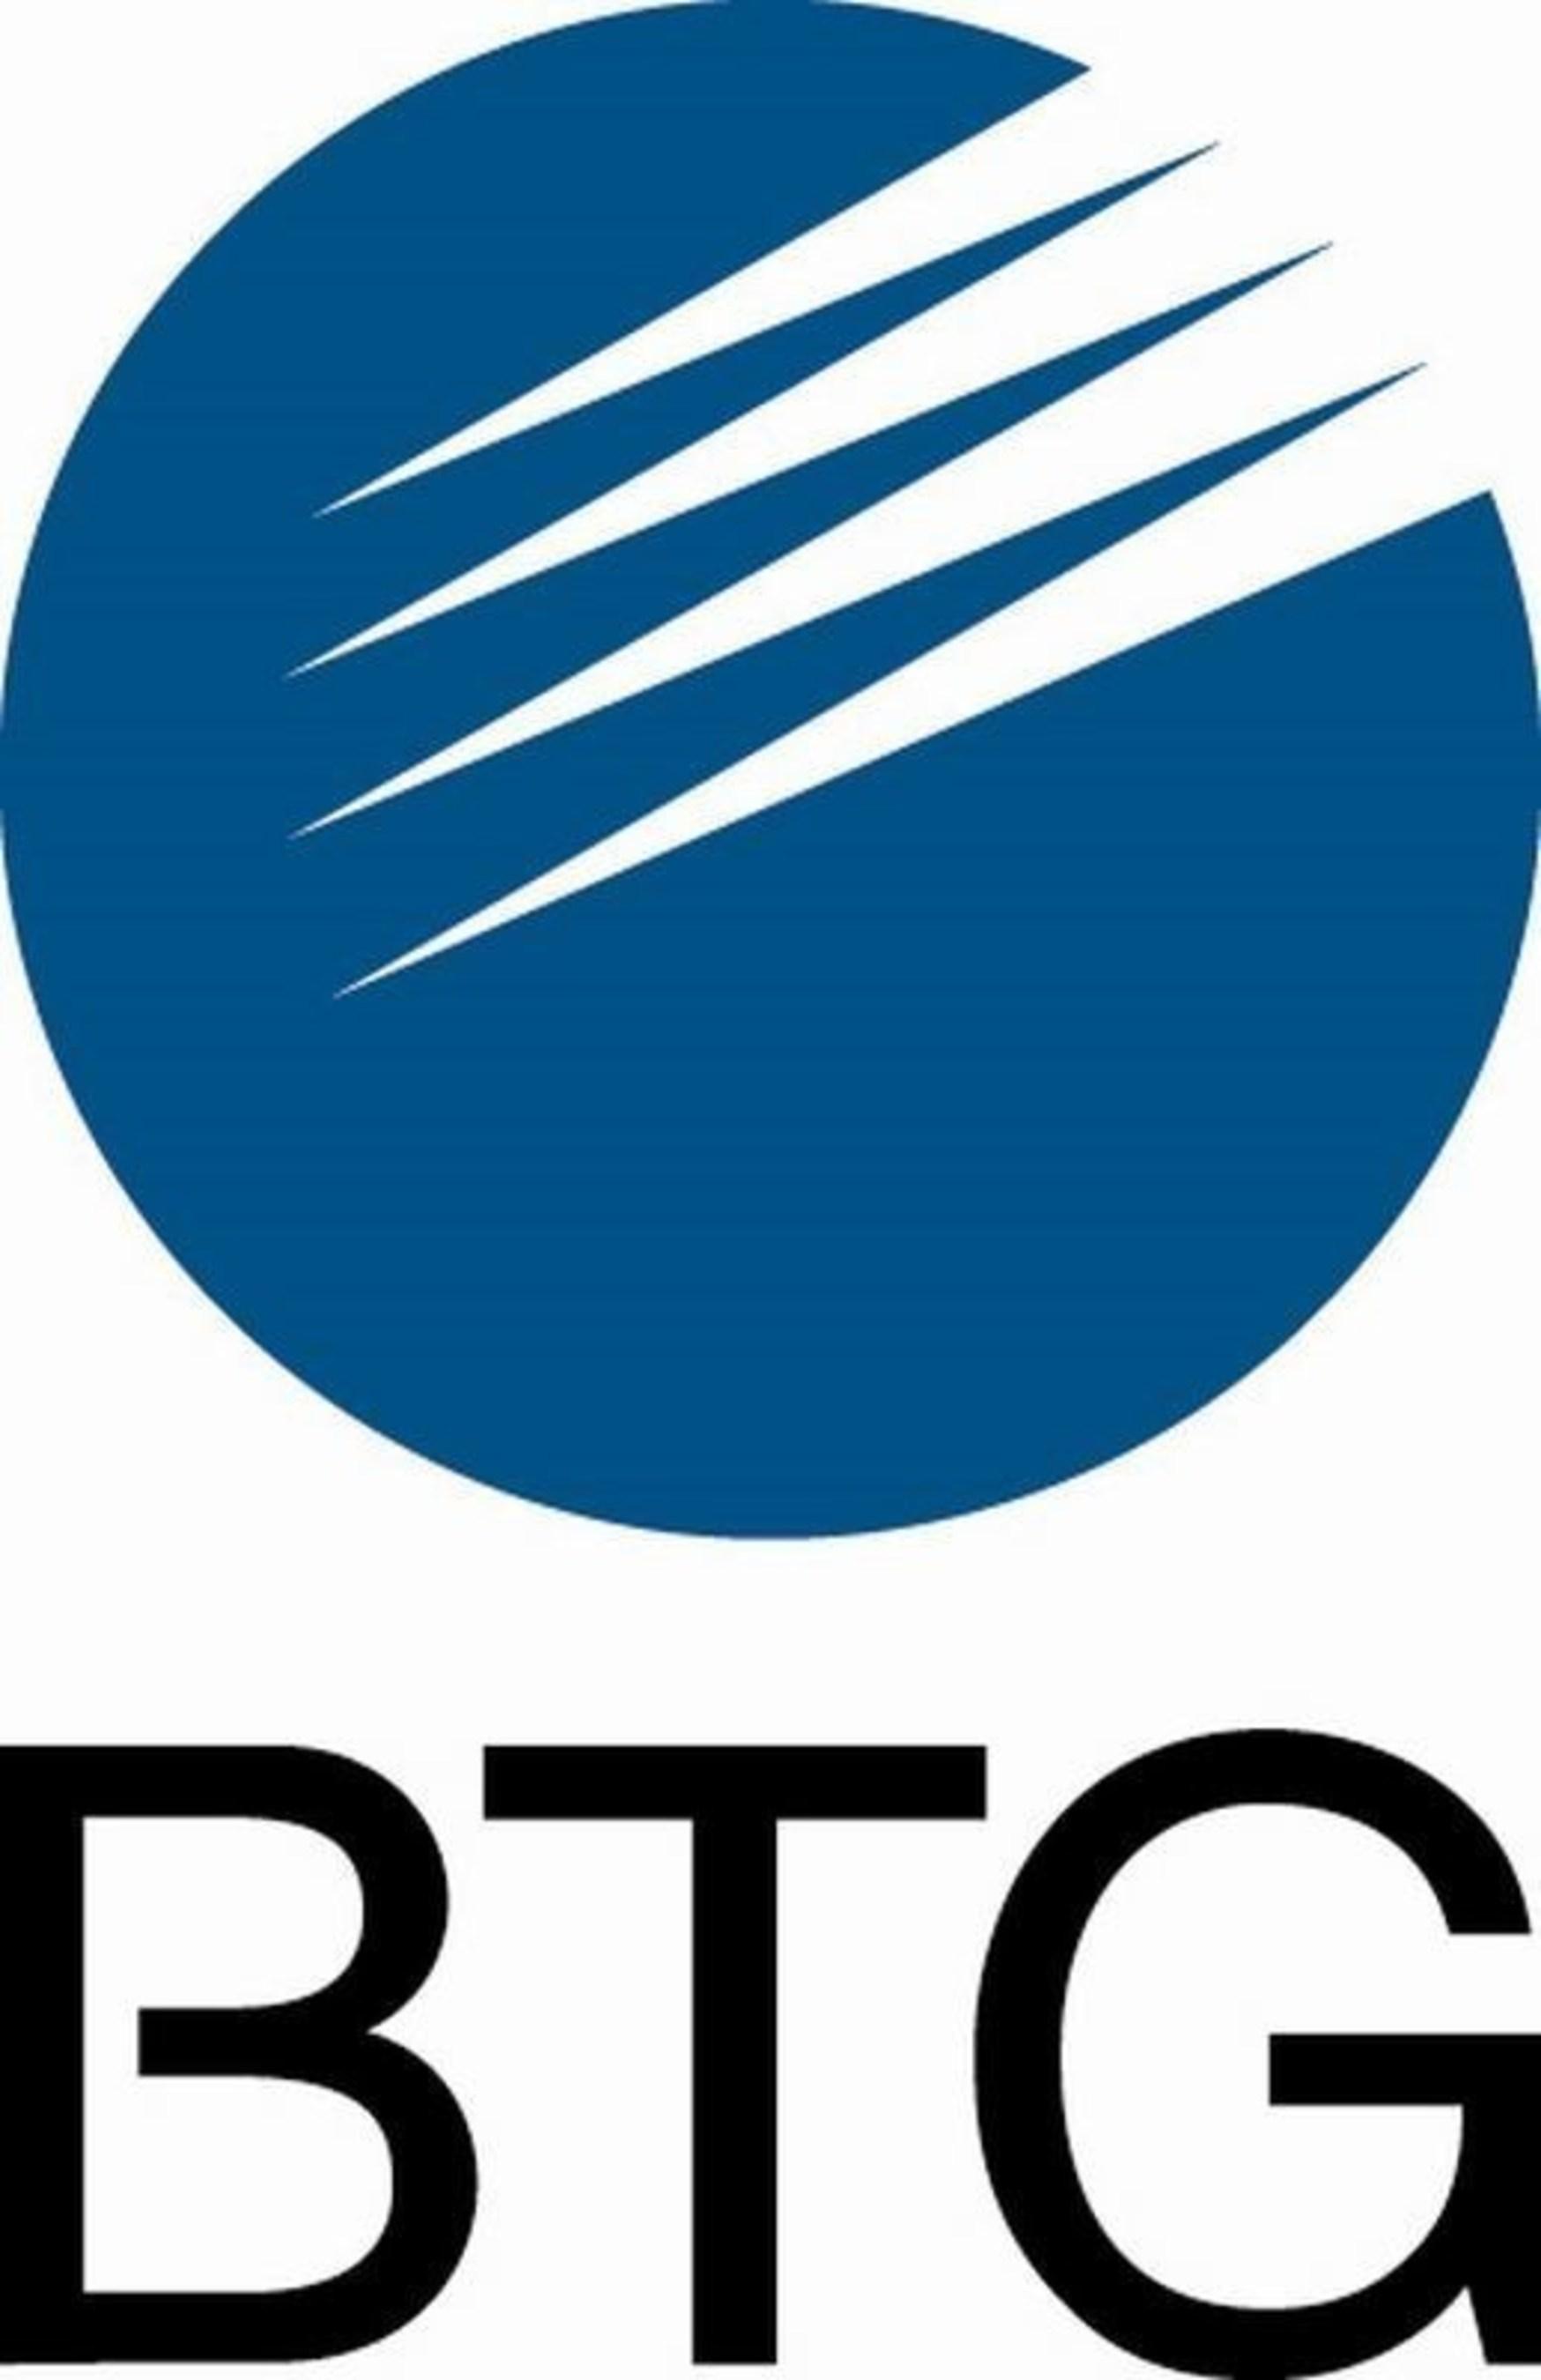 BTG Logo (PRNewsFoto/BTG Plc) (PRNewsFoto/BTG Plc)